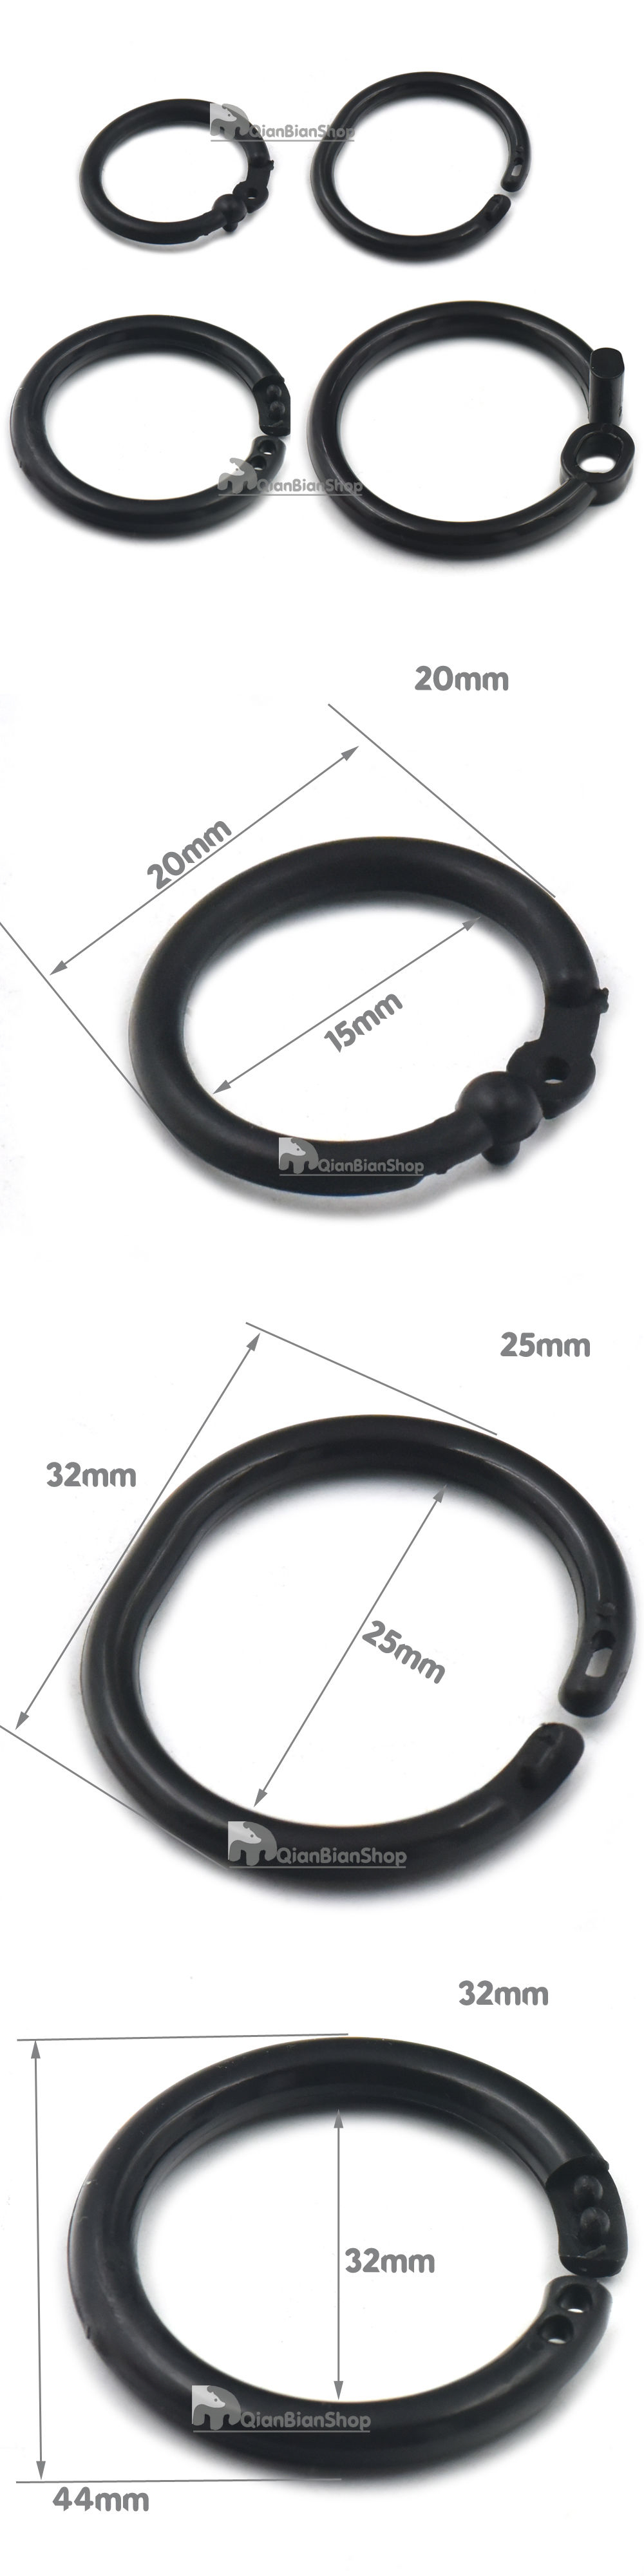 Rings 113341: 15Mm 25Mm 32Mm 45Mm Plastic Open O Rings For Dee ...